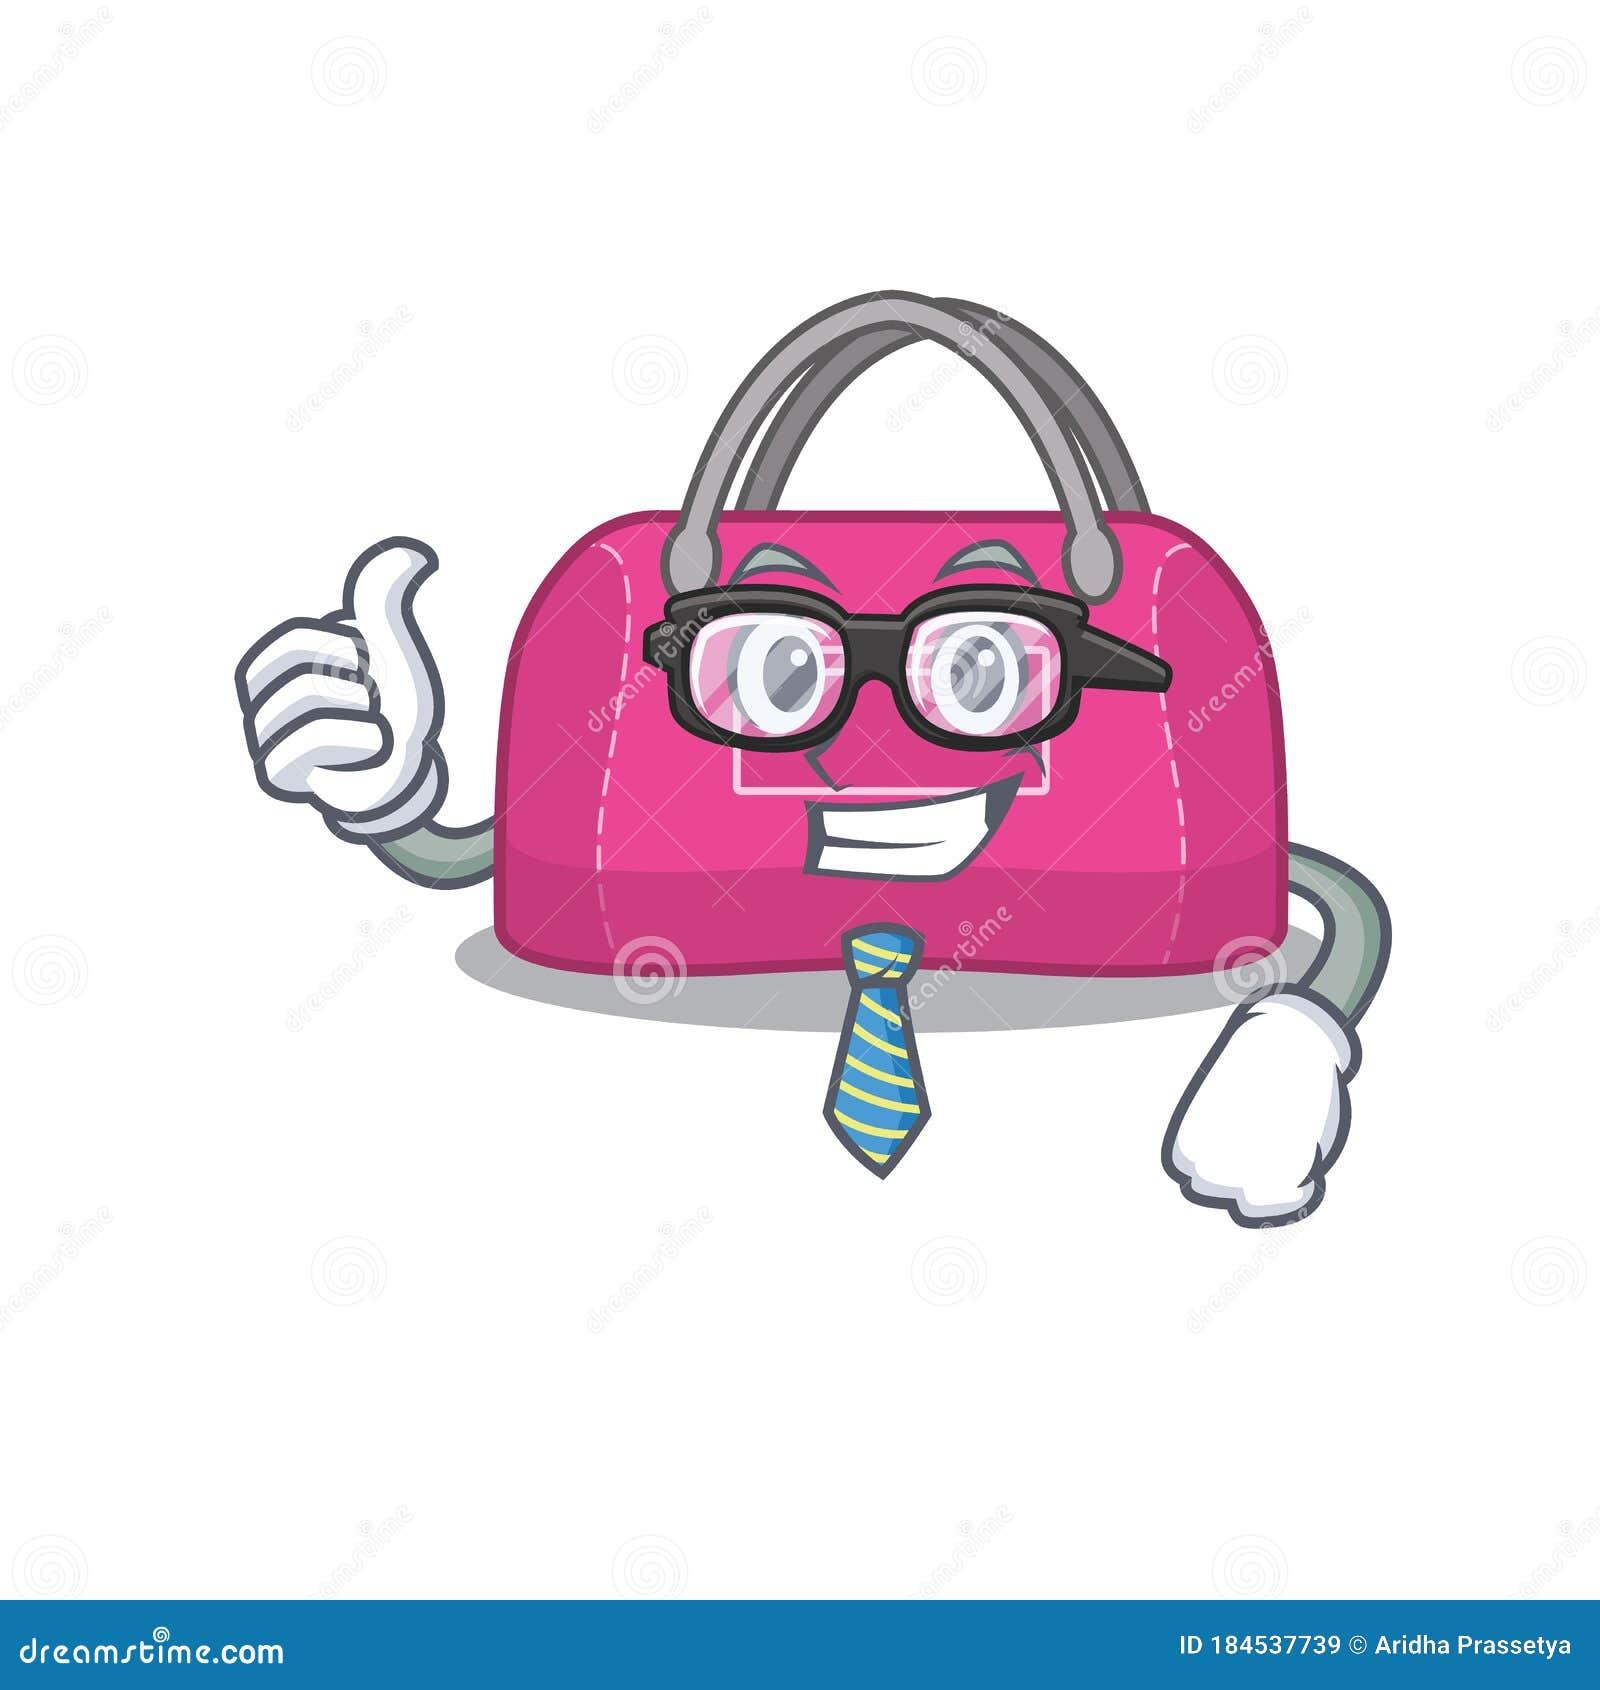 Cartoon Drawing Of Woman Sport Bag Businessman Wearing Glasses And Tie Stock Vector Illustration Of Handbag Hand 184537739